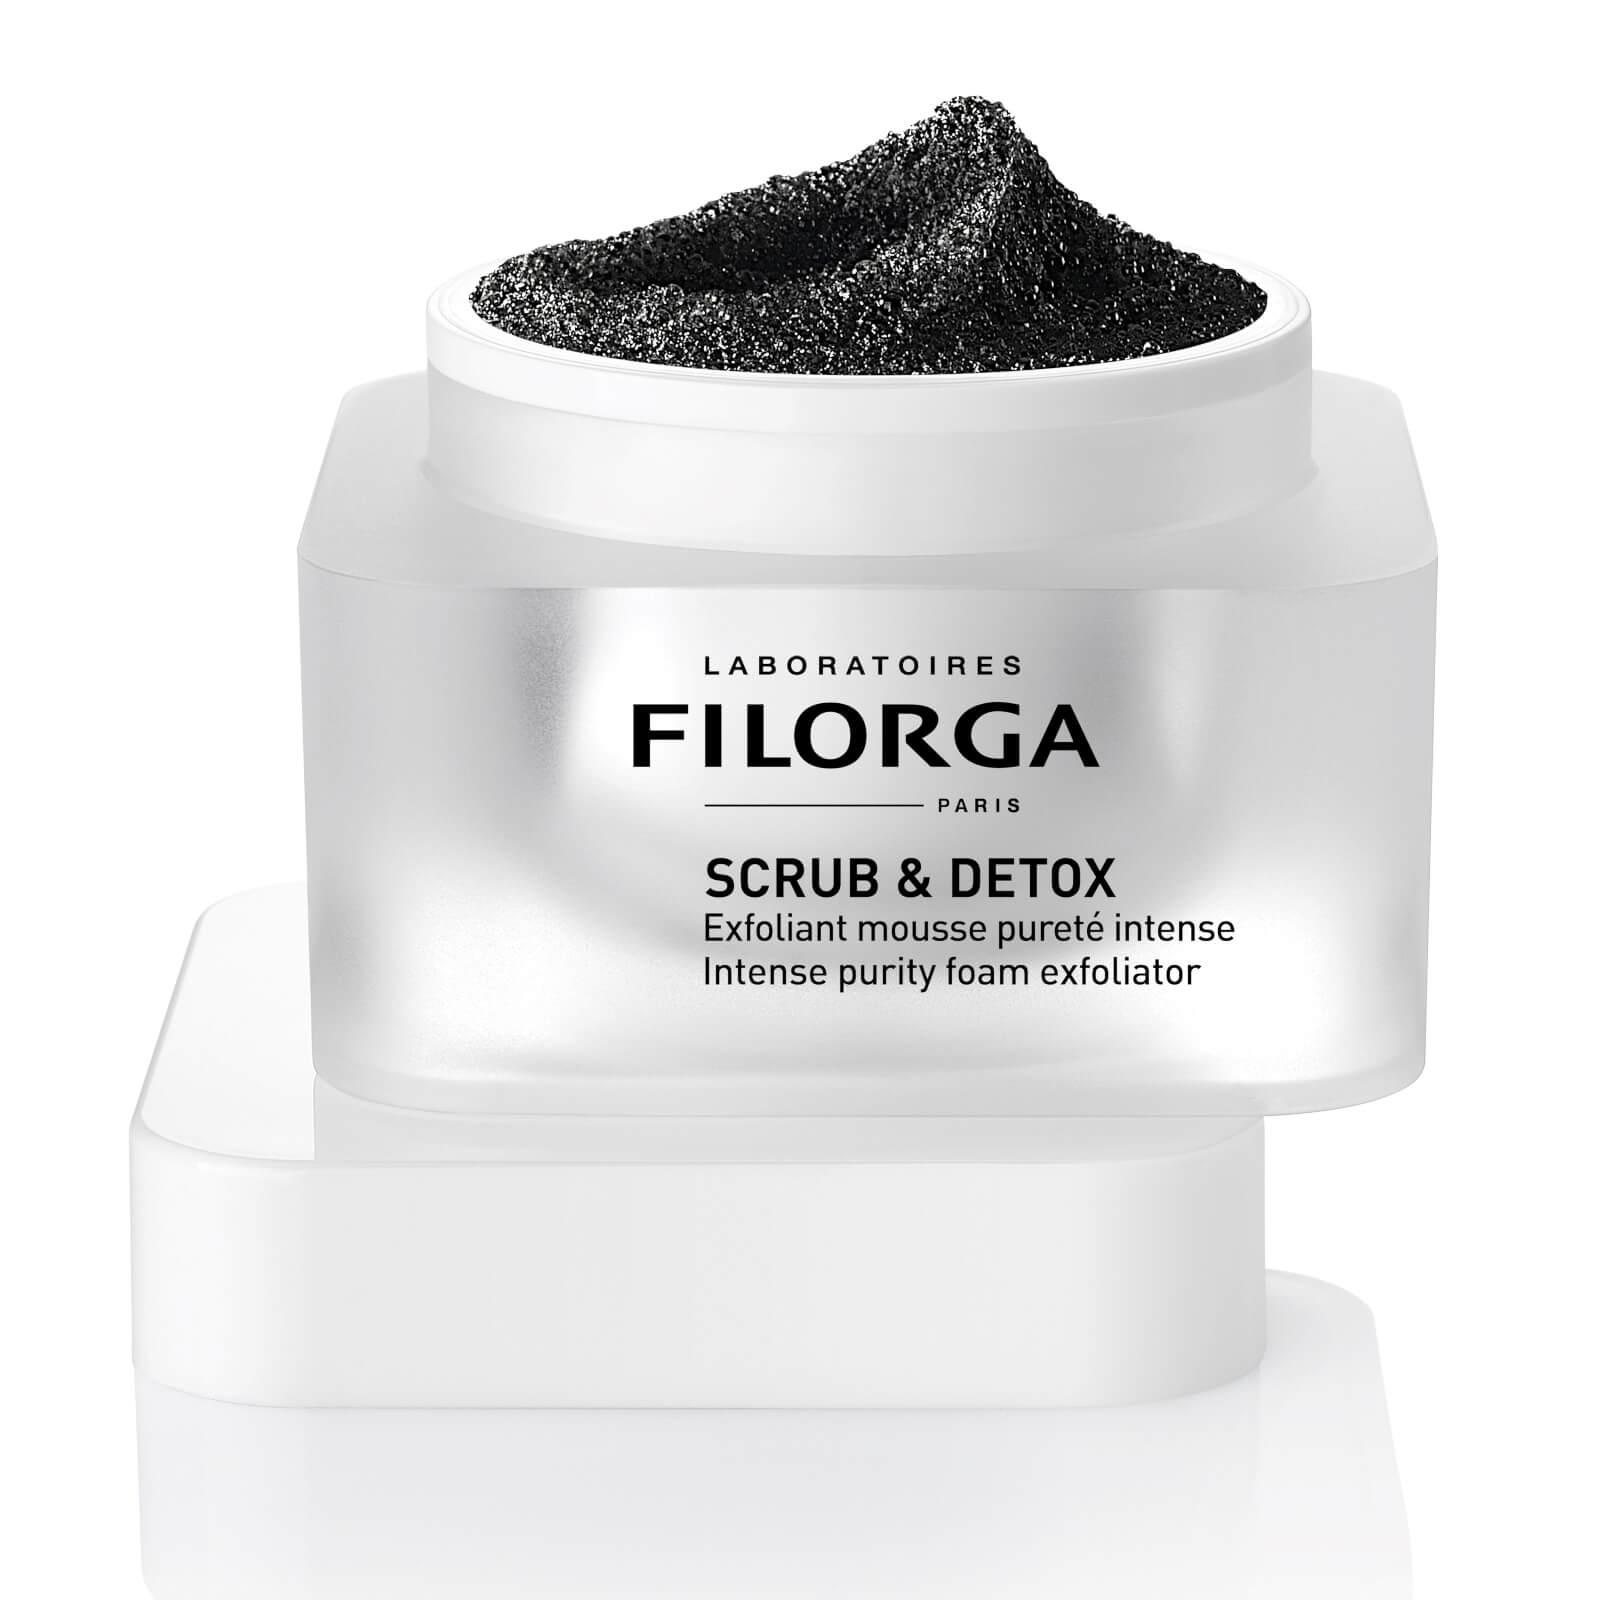 Filorga Scrub & Detox Exfoliator Exclusive